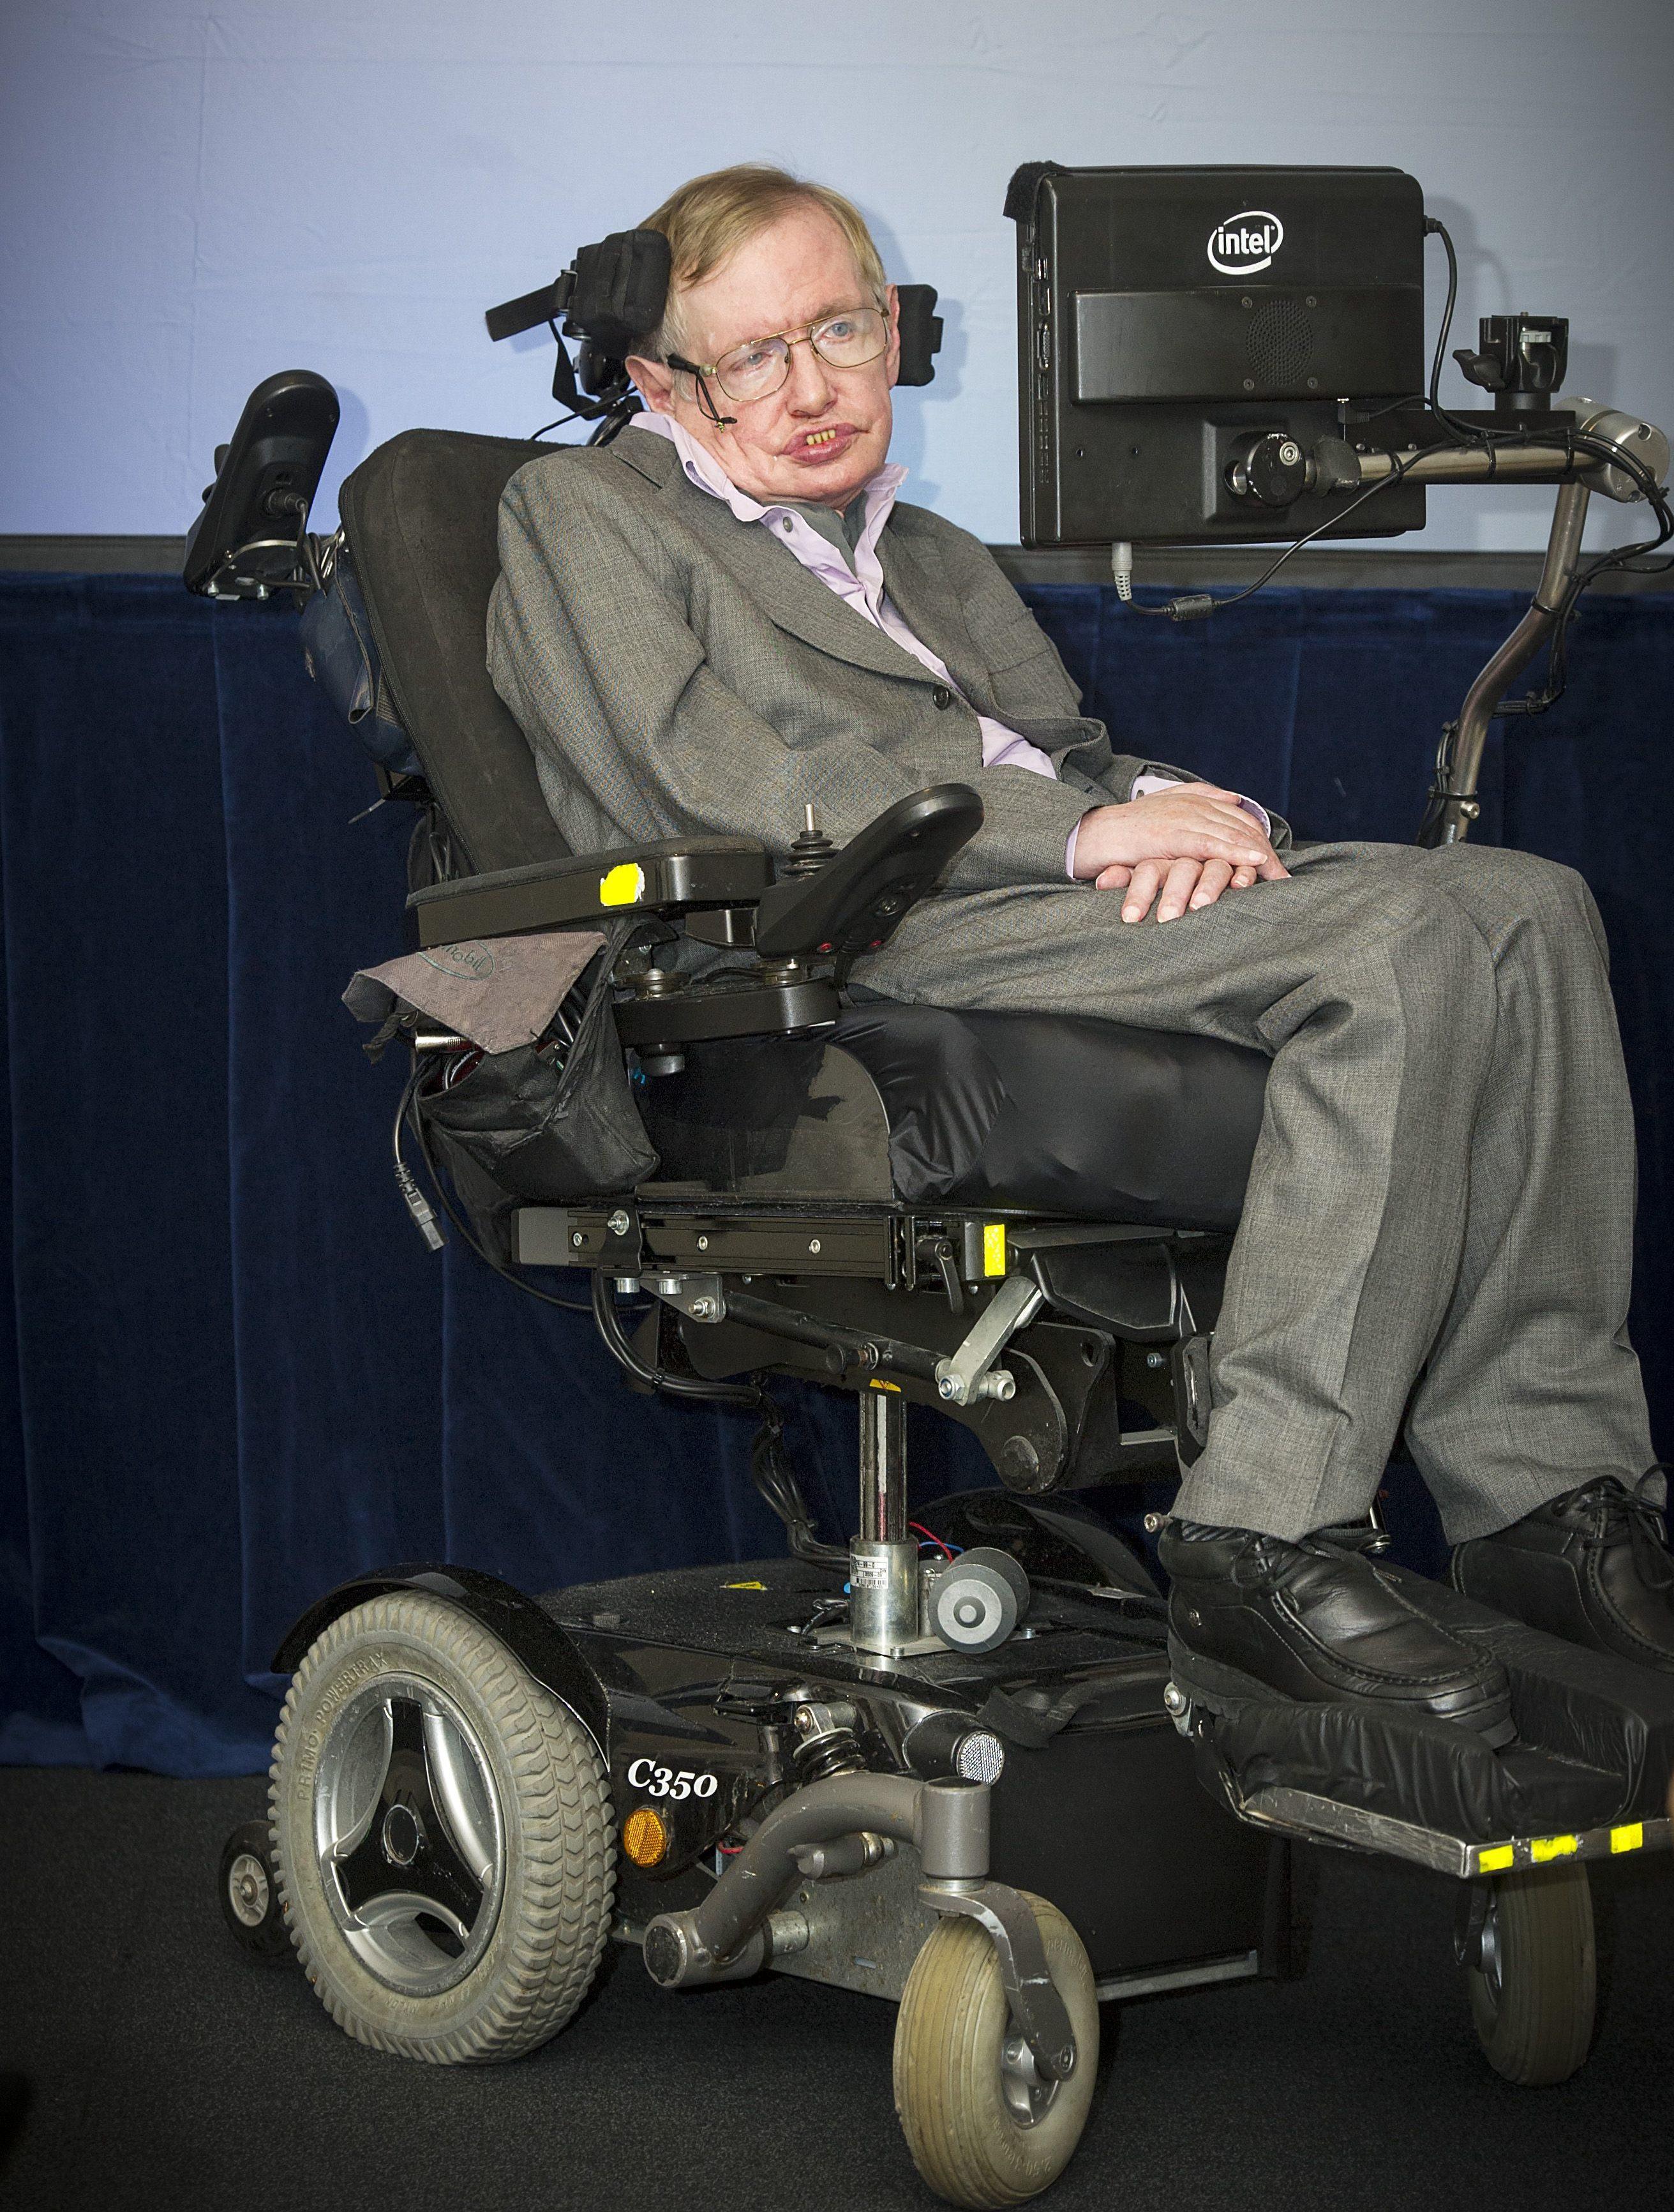 Mandatory Credit: Photo by Geoff Pugh/Shutterstock (4273603c) Stephen Hawking Stephen Hawking attends Intel press conference at the Savoy Hotel, London, Britain - 02 Dec 2014